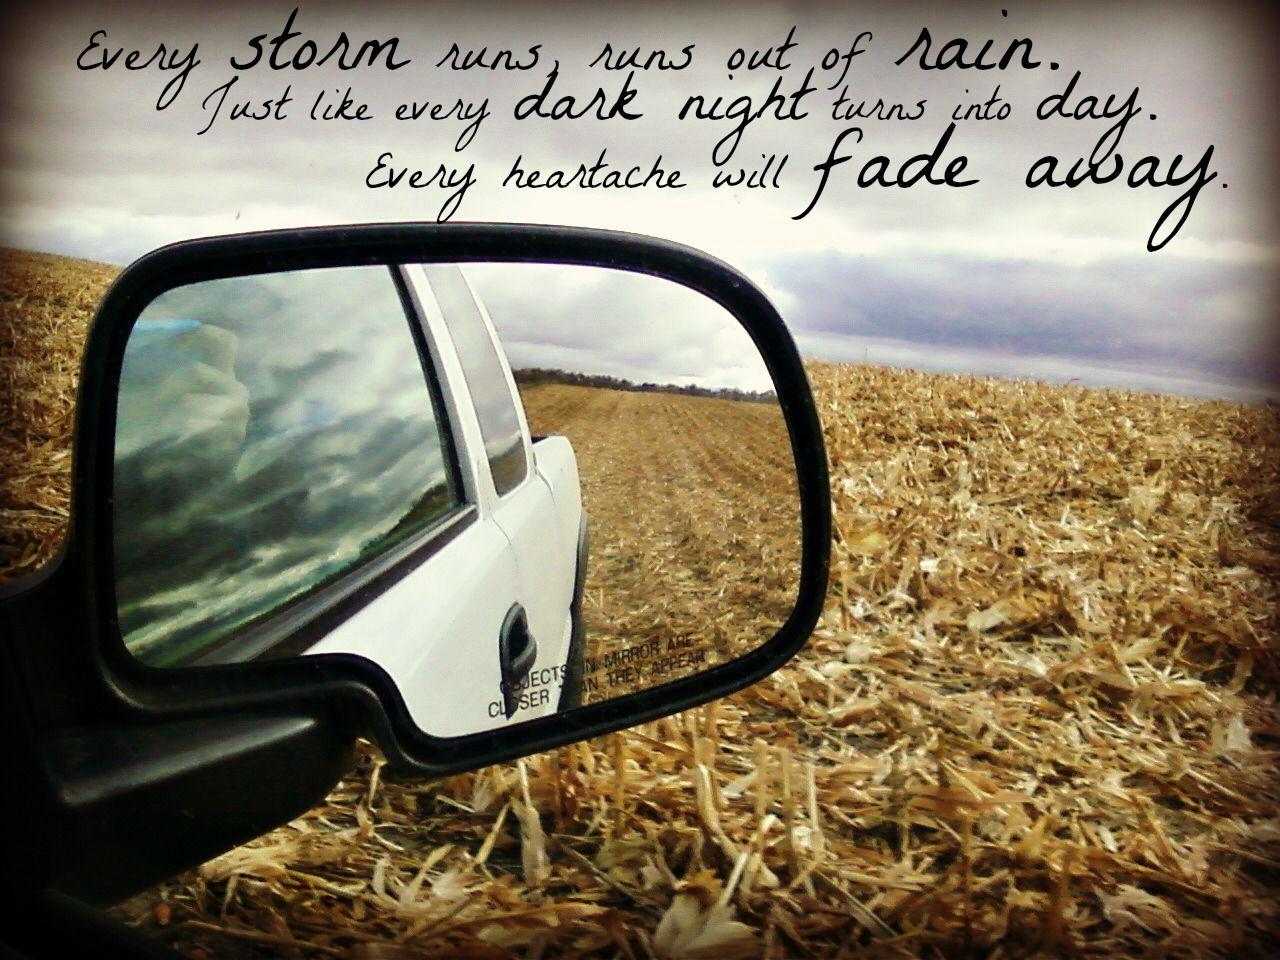 Every Storm Runs, Runs Out Of Rain. Every Dark Night Turns